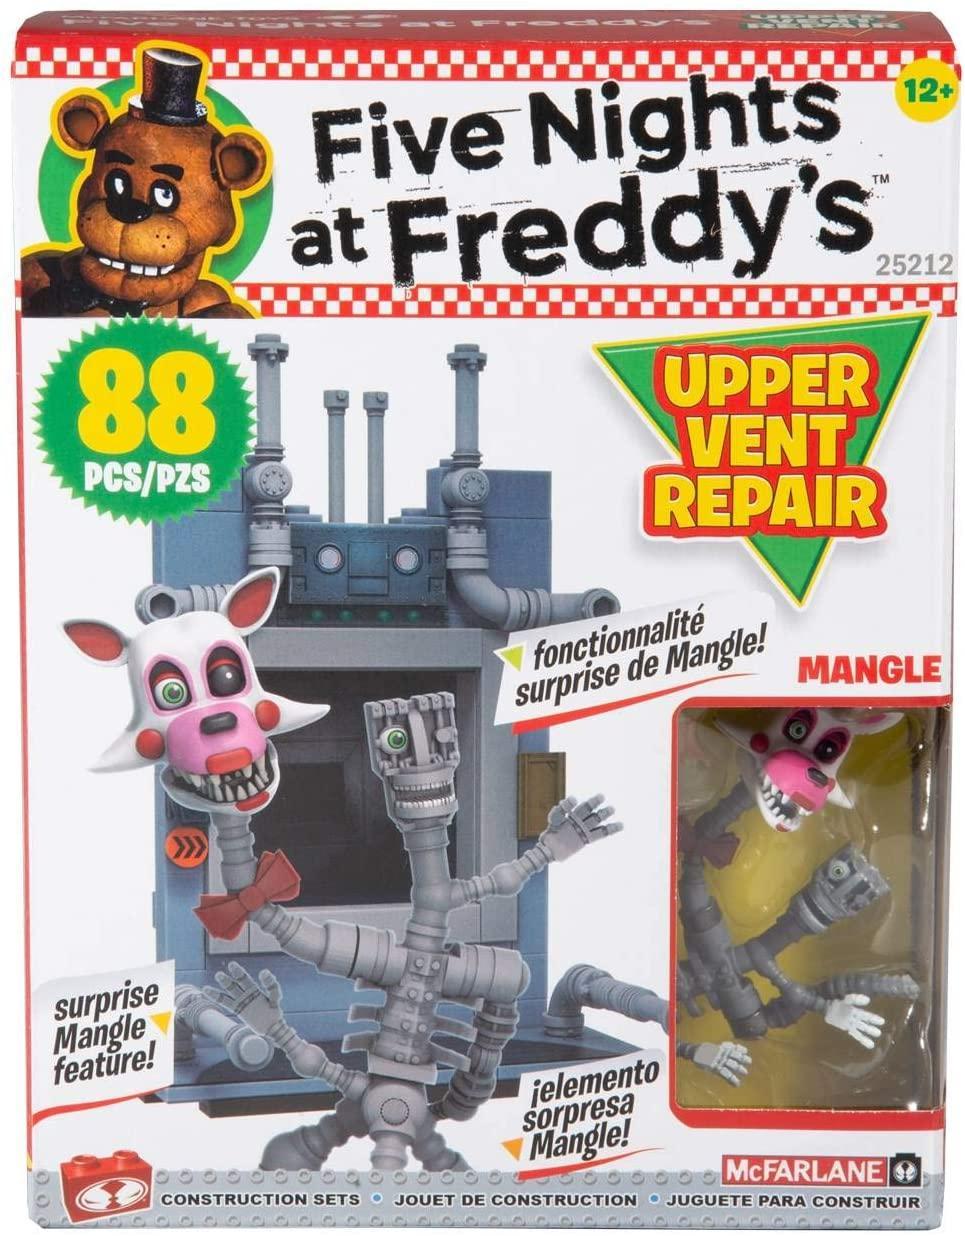 Конструктор 5 ночей с Фредди McFarlane Toys Five Nights at Freddy's Особенный Мангл